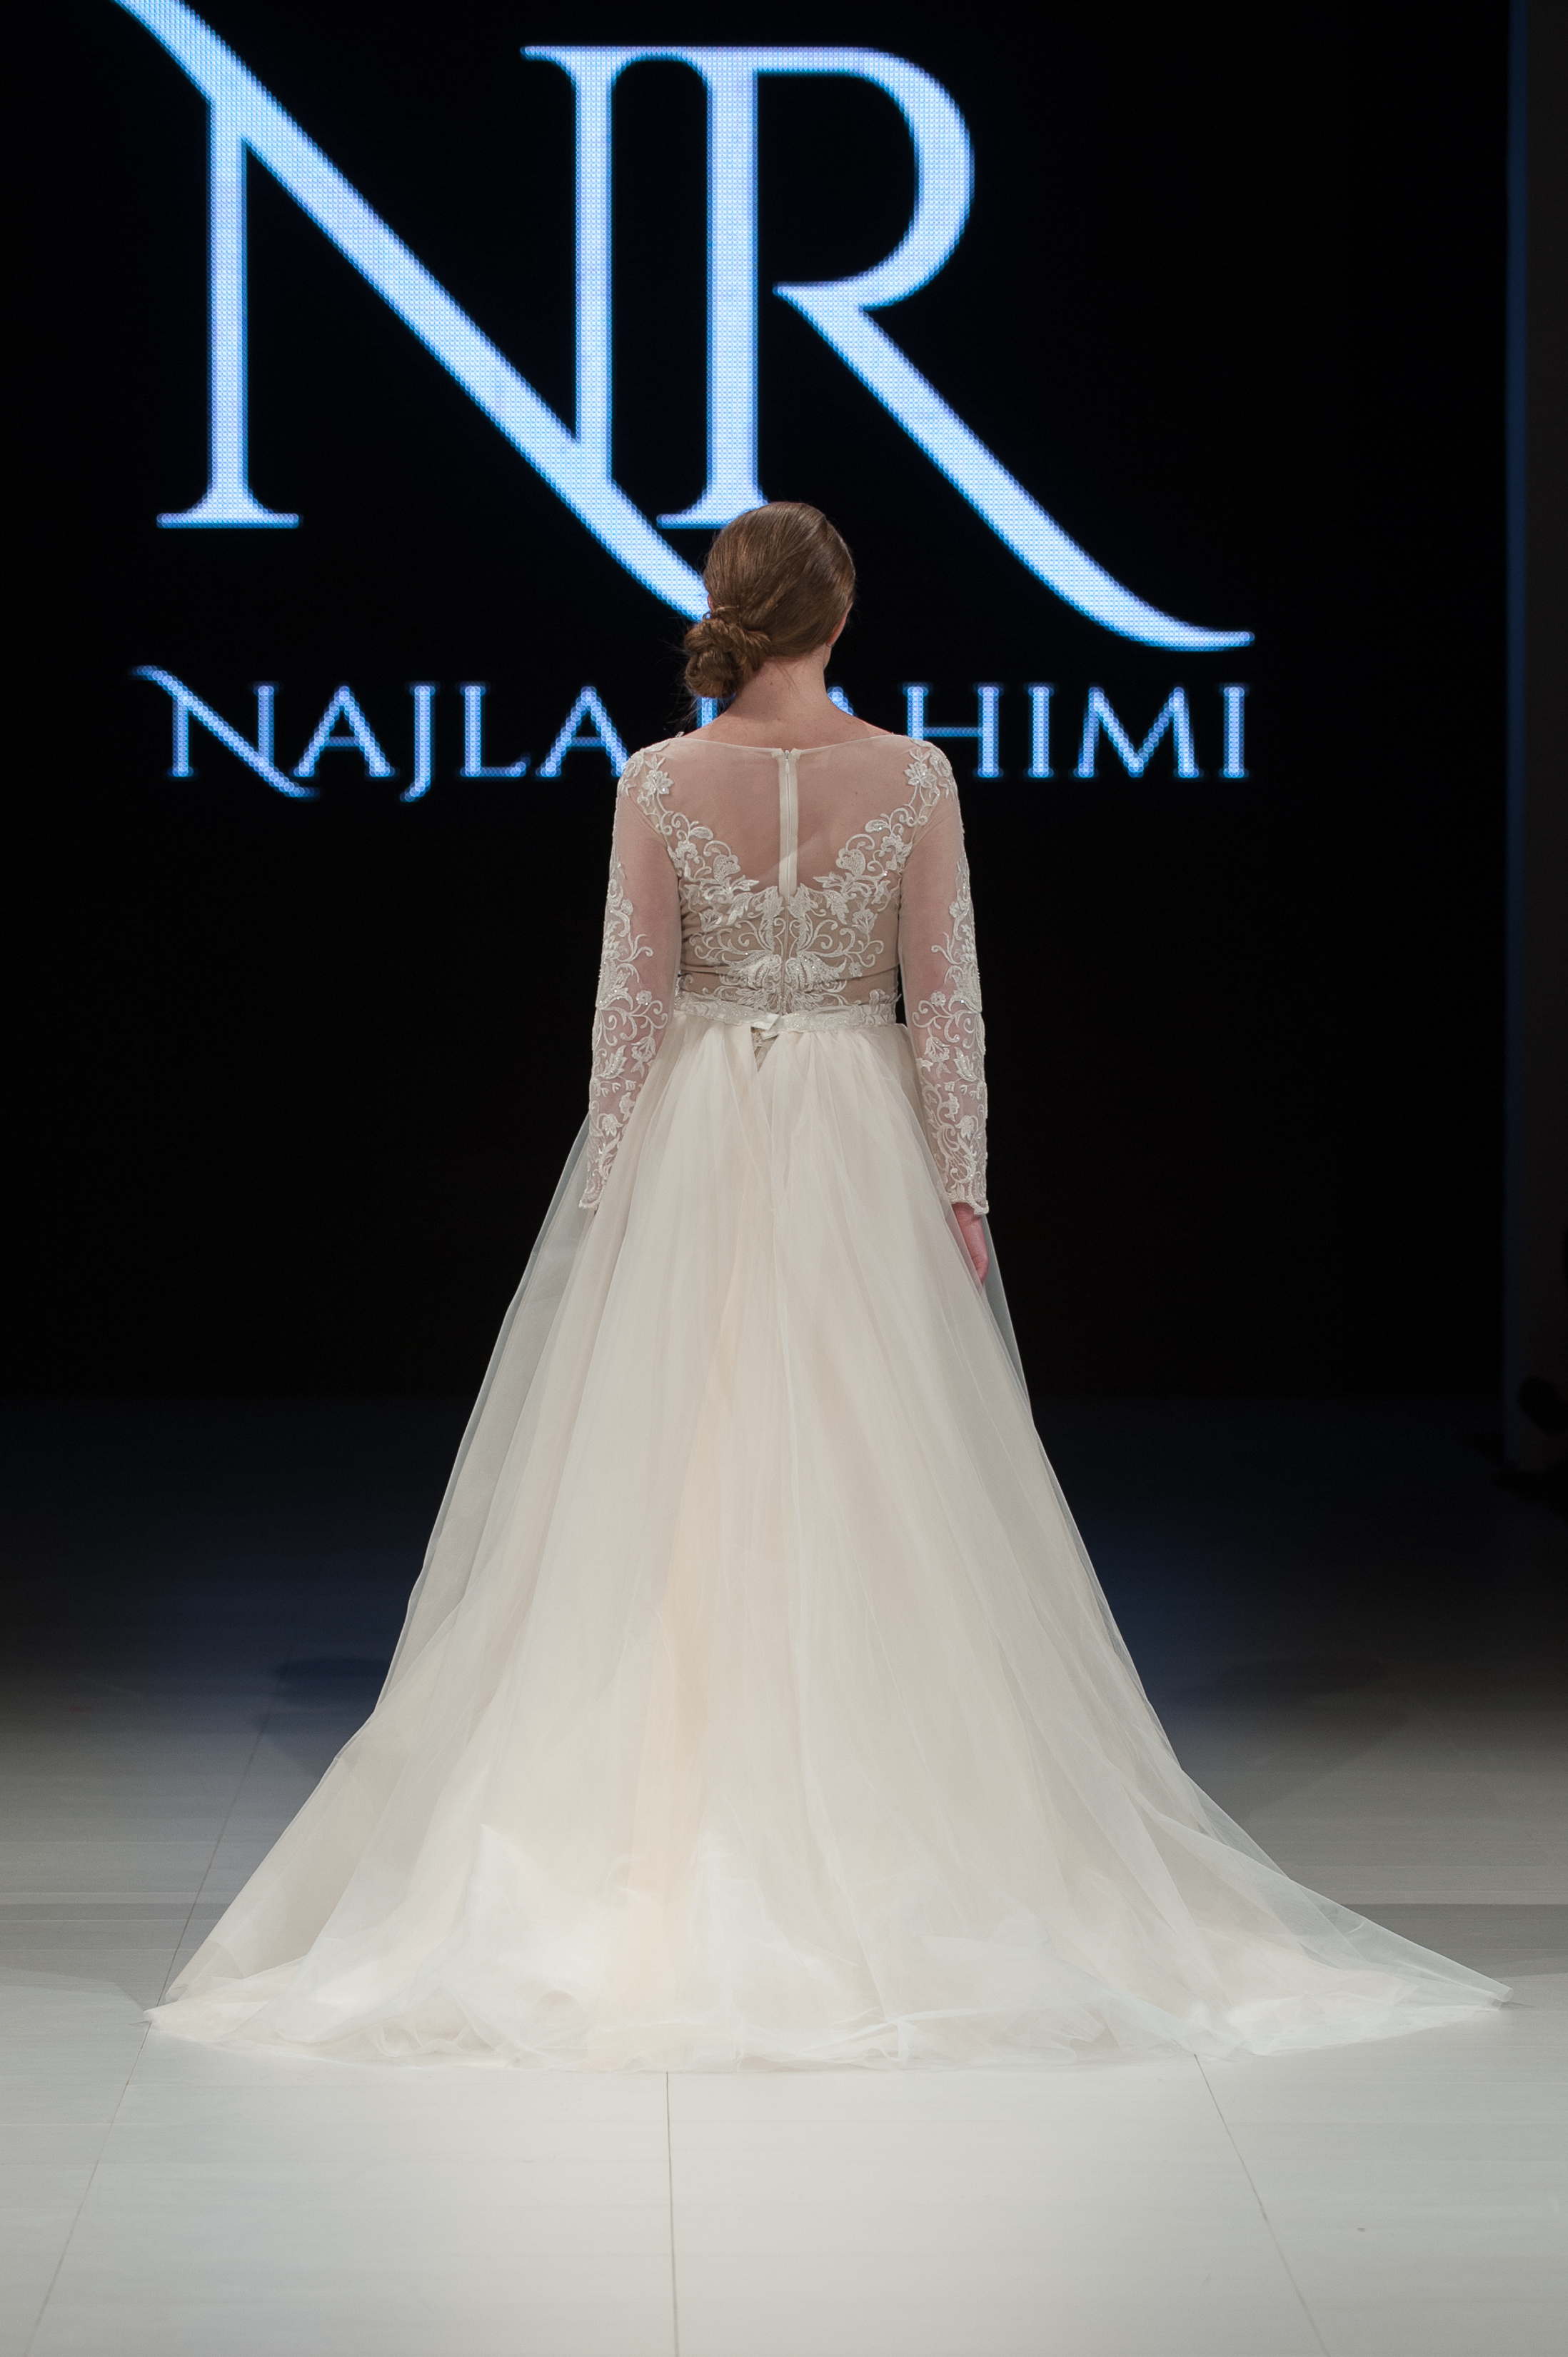 FAT2018-Day1-April17-Najla_Rahimi-Runway-Che_Rosales-LARAWAN-5744.jpg